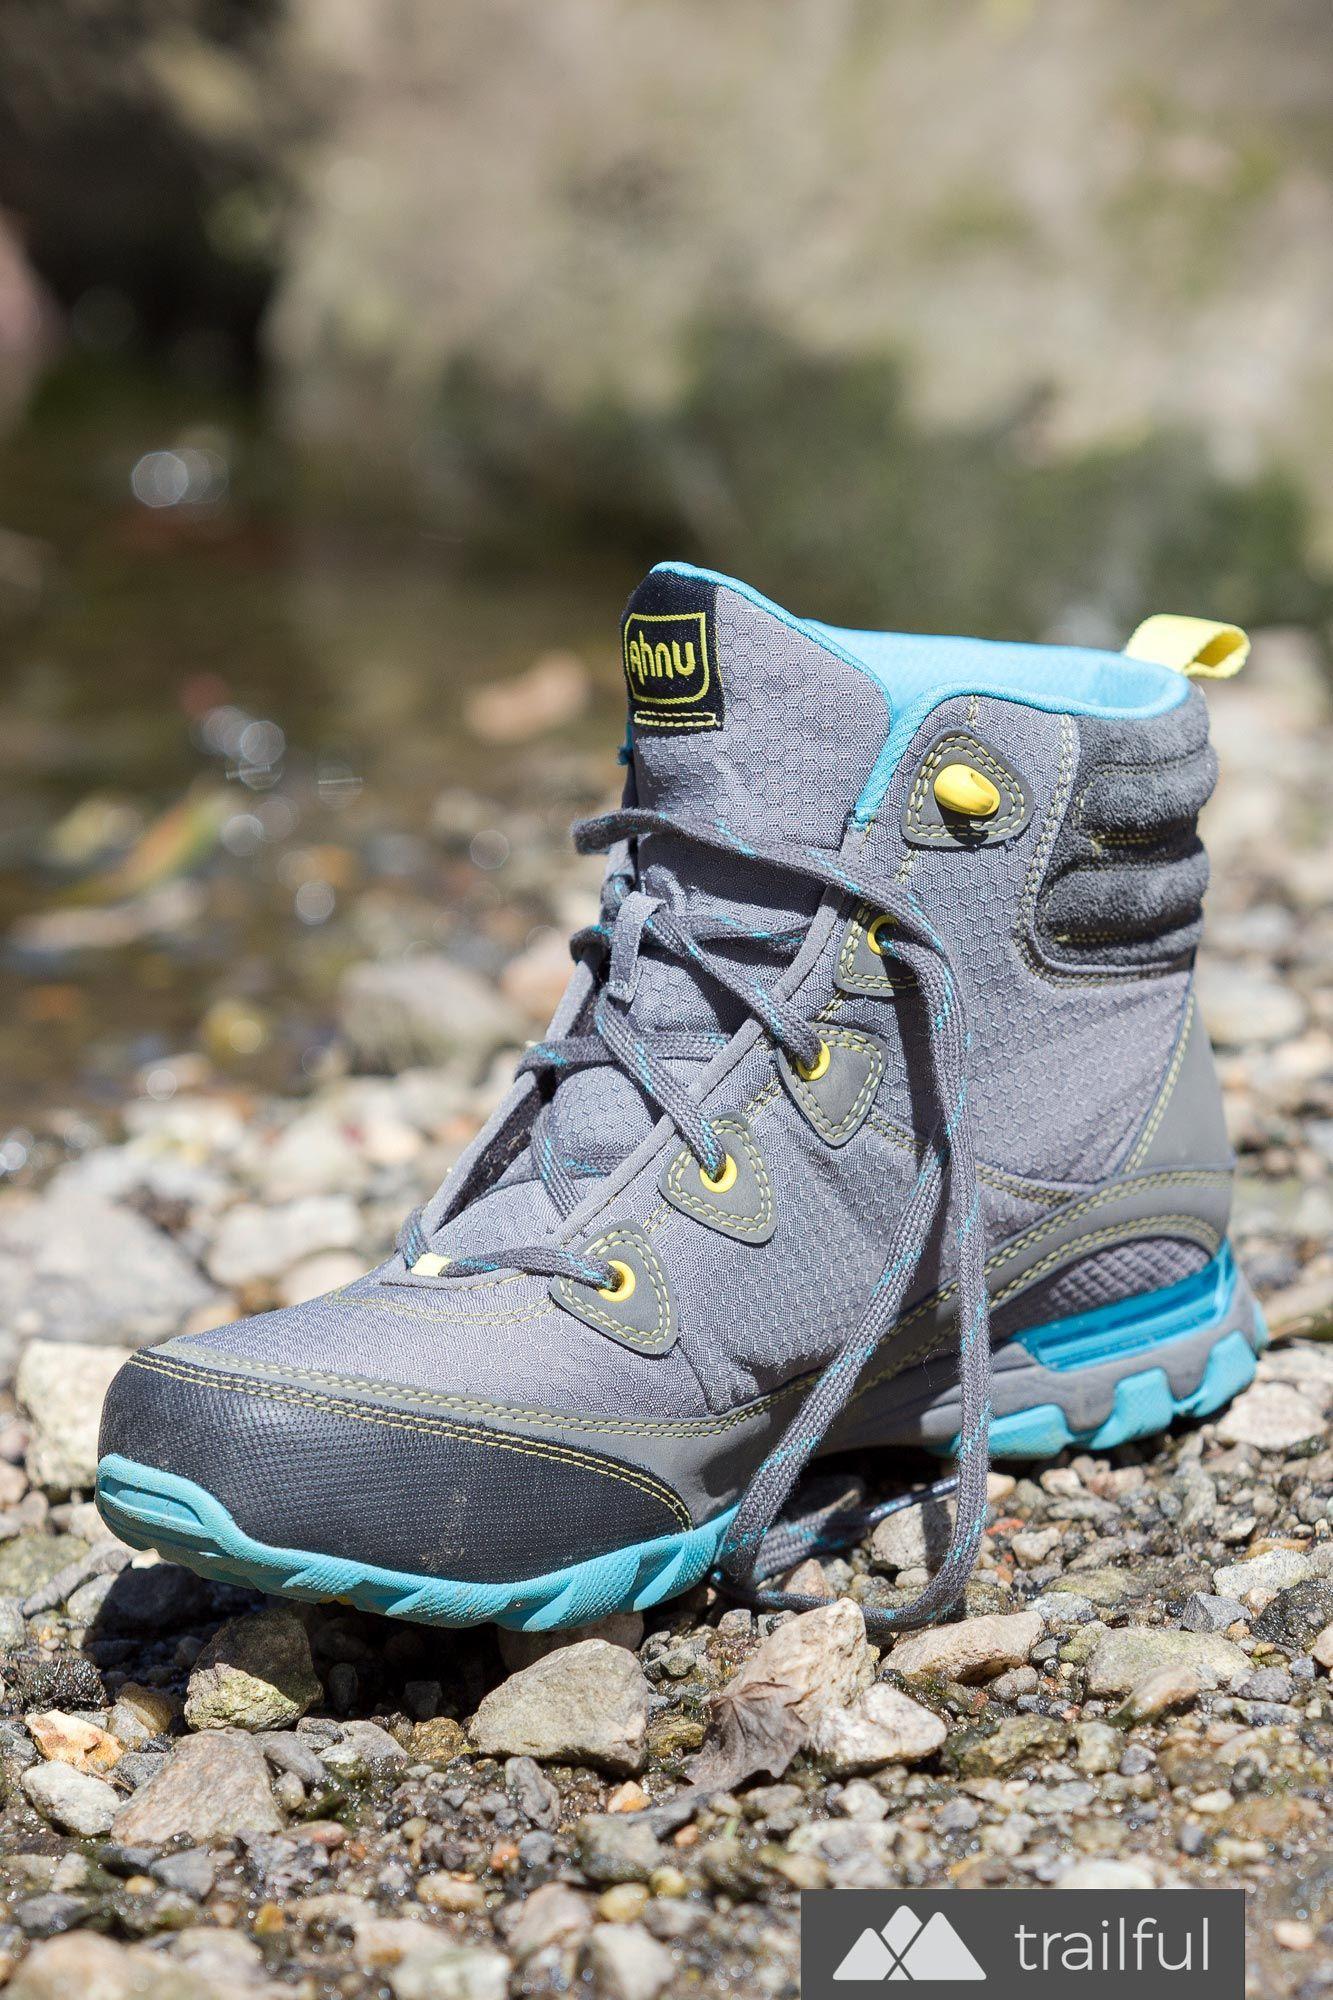 5615017d789 Ahnu Sugarpine women's waterproof hiking boot review | Our favorite ...